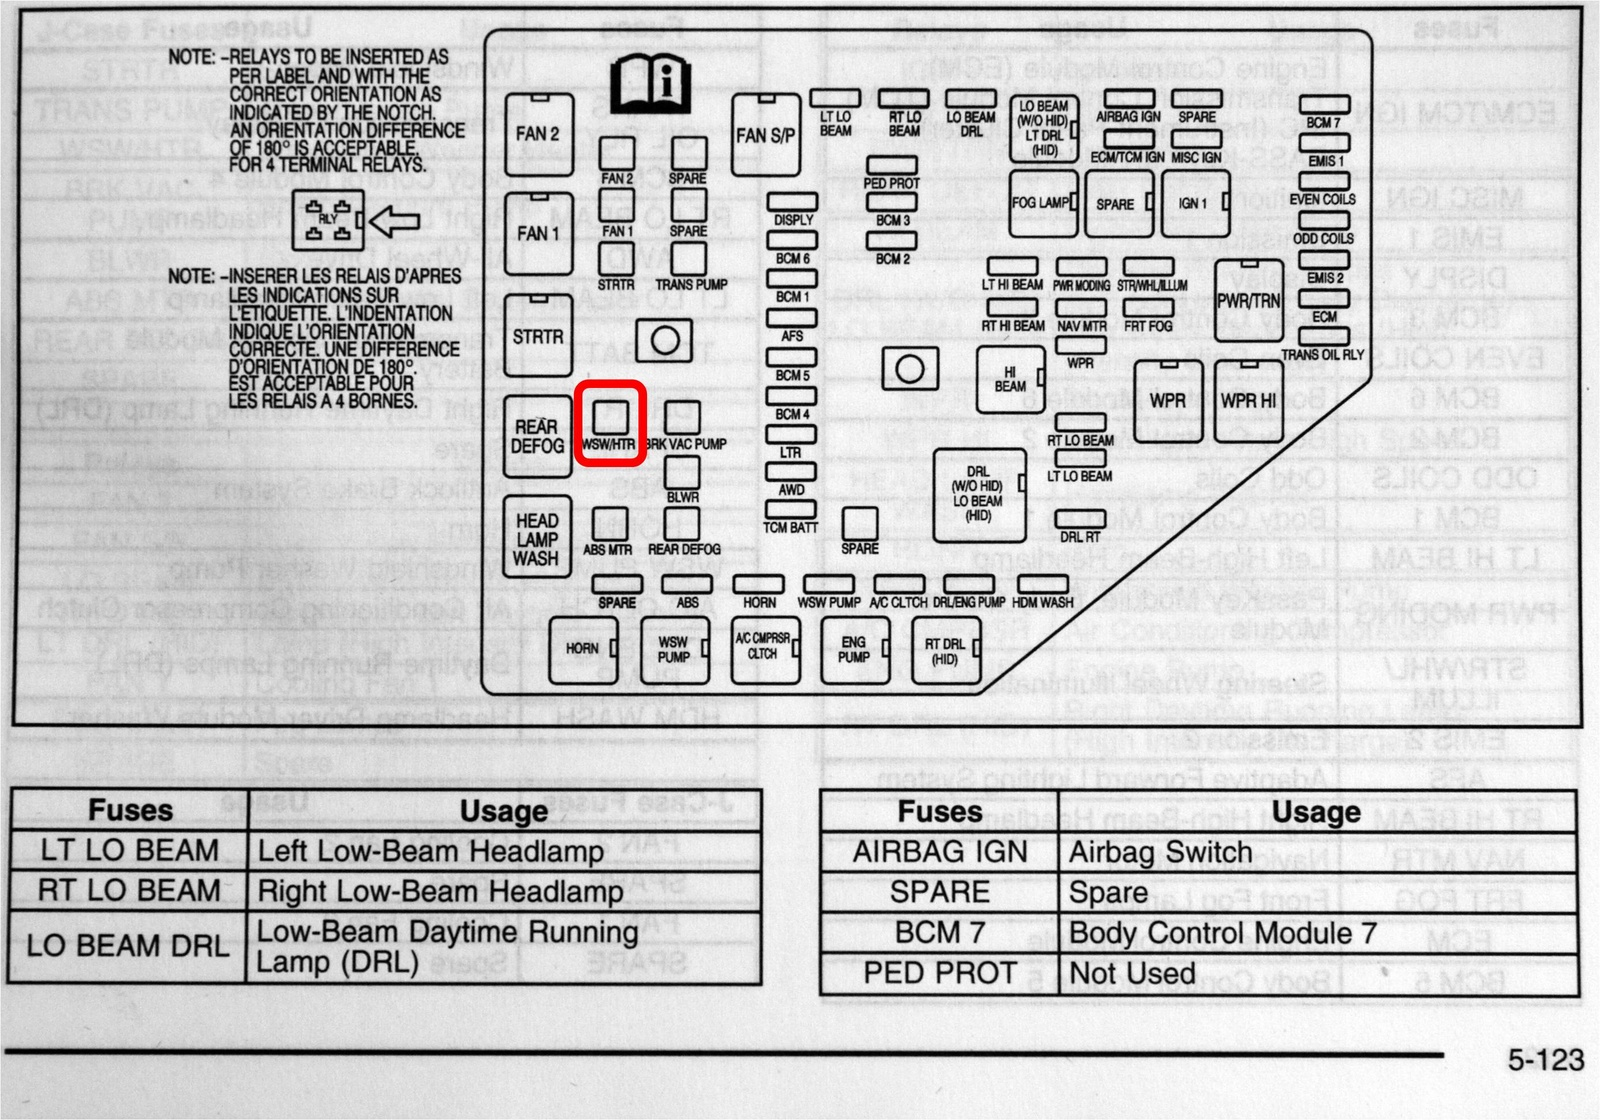 Wondrous 1998 Ford F 150 Fuse Box Diagram Dome Online Wiring Diagram Wiring Cloud Domeilariaidewilluminateatxorg